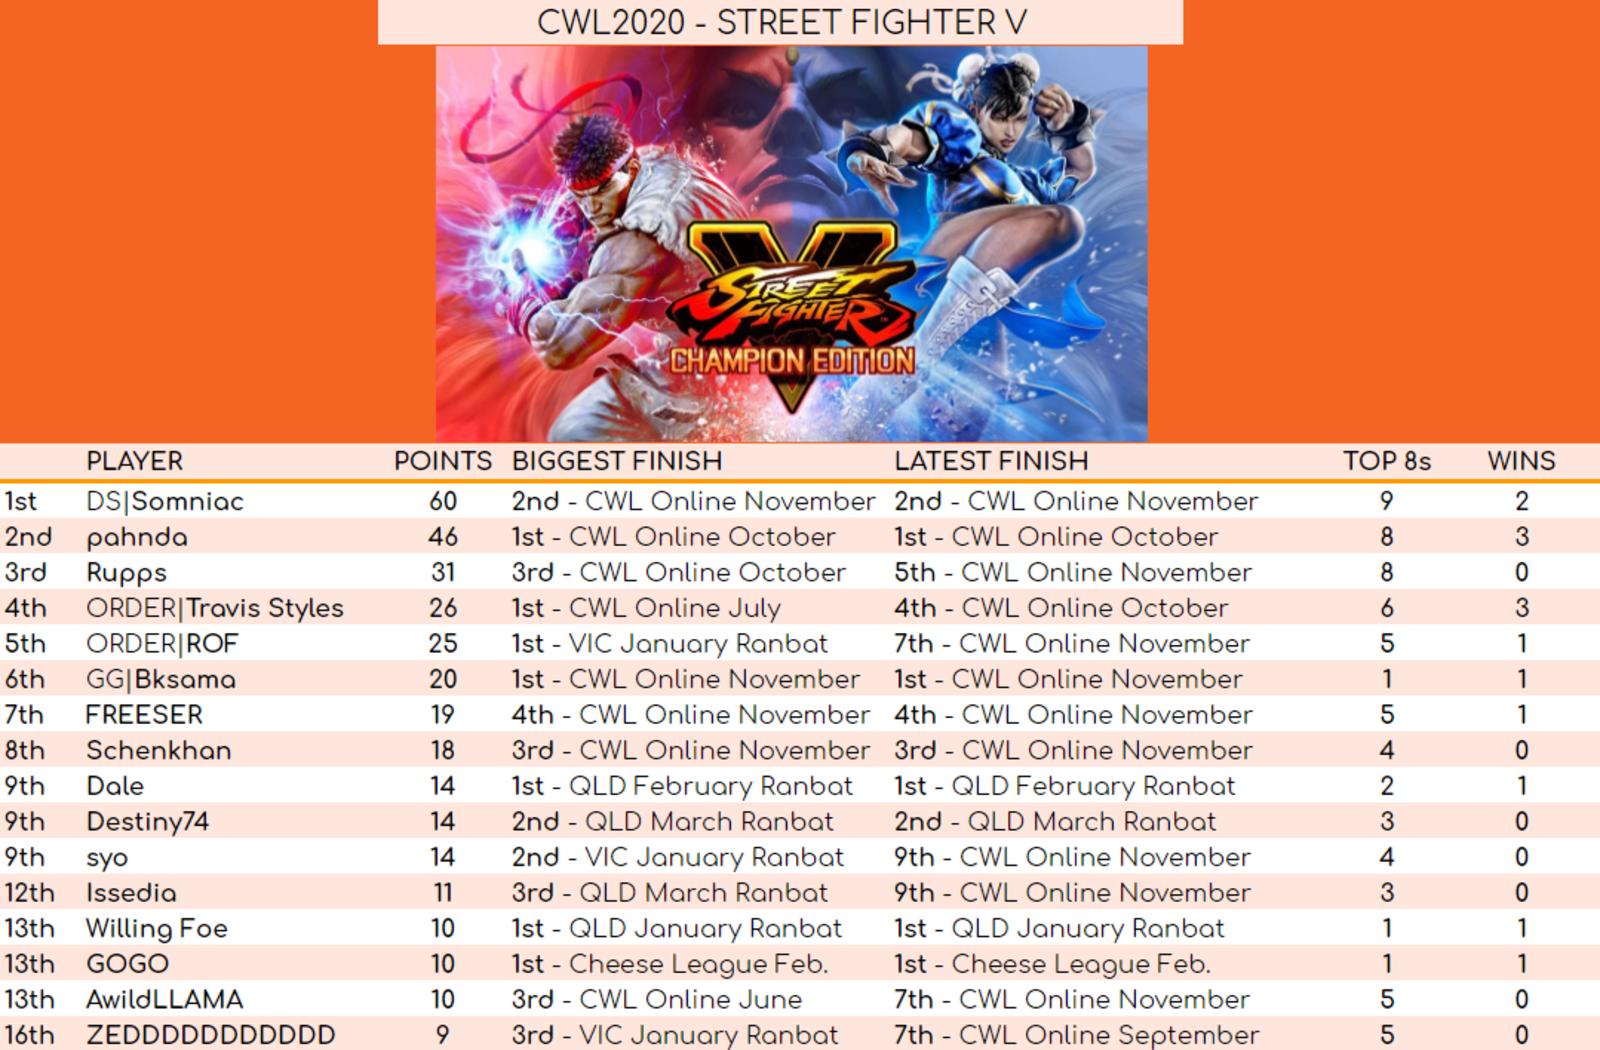 SFV Final Standings 2020